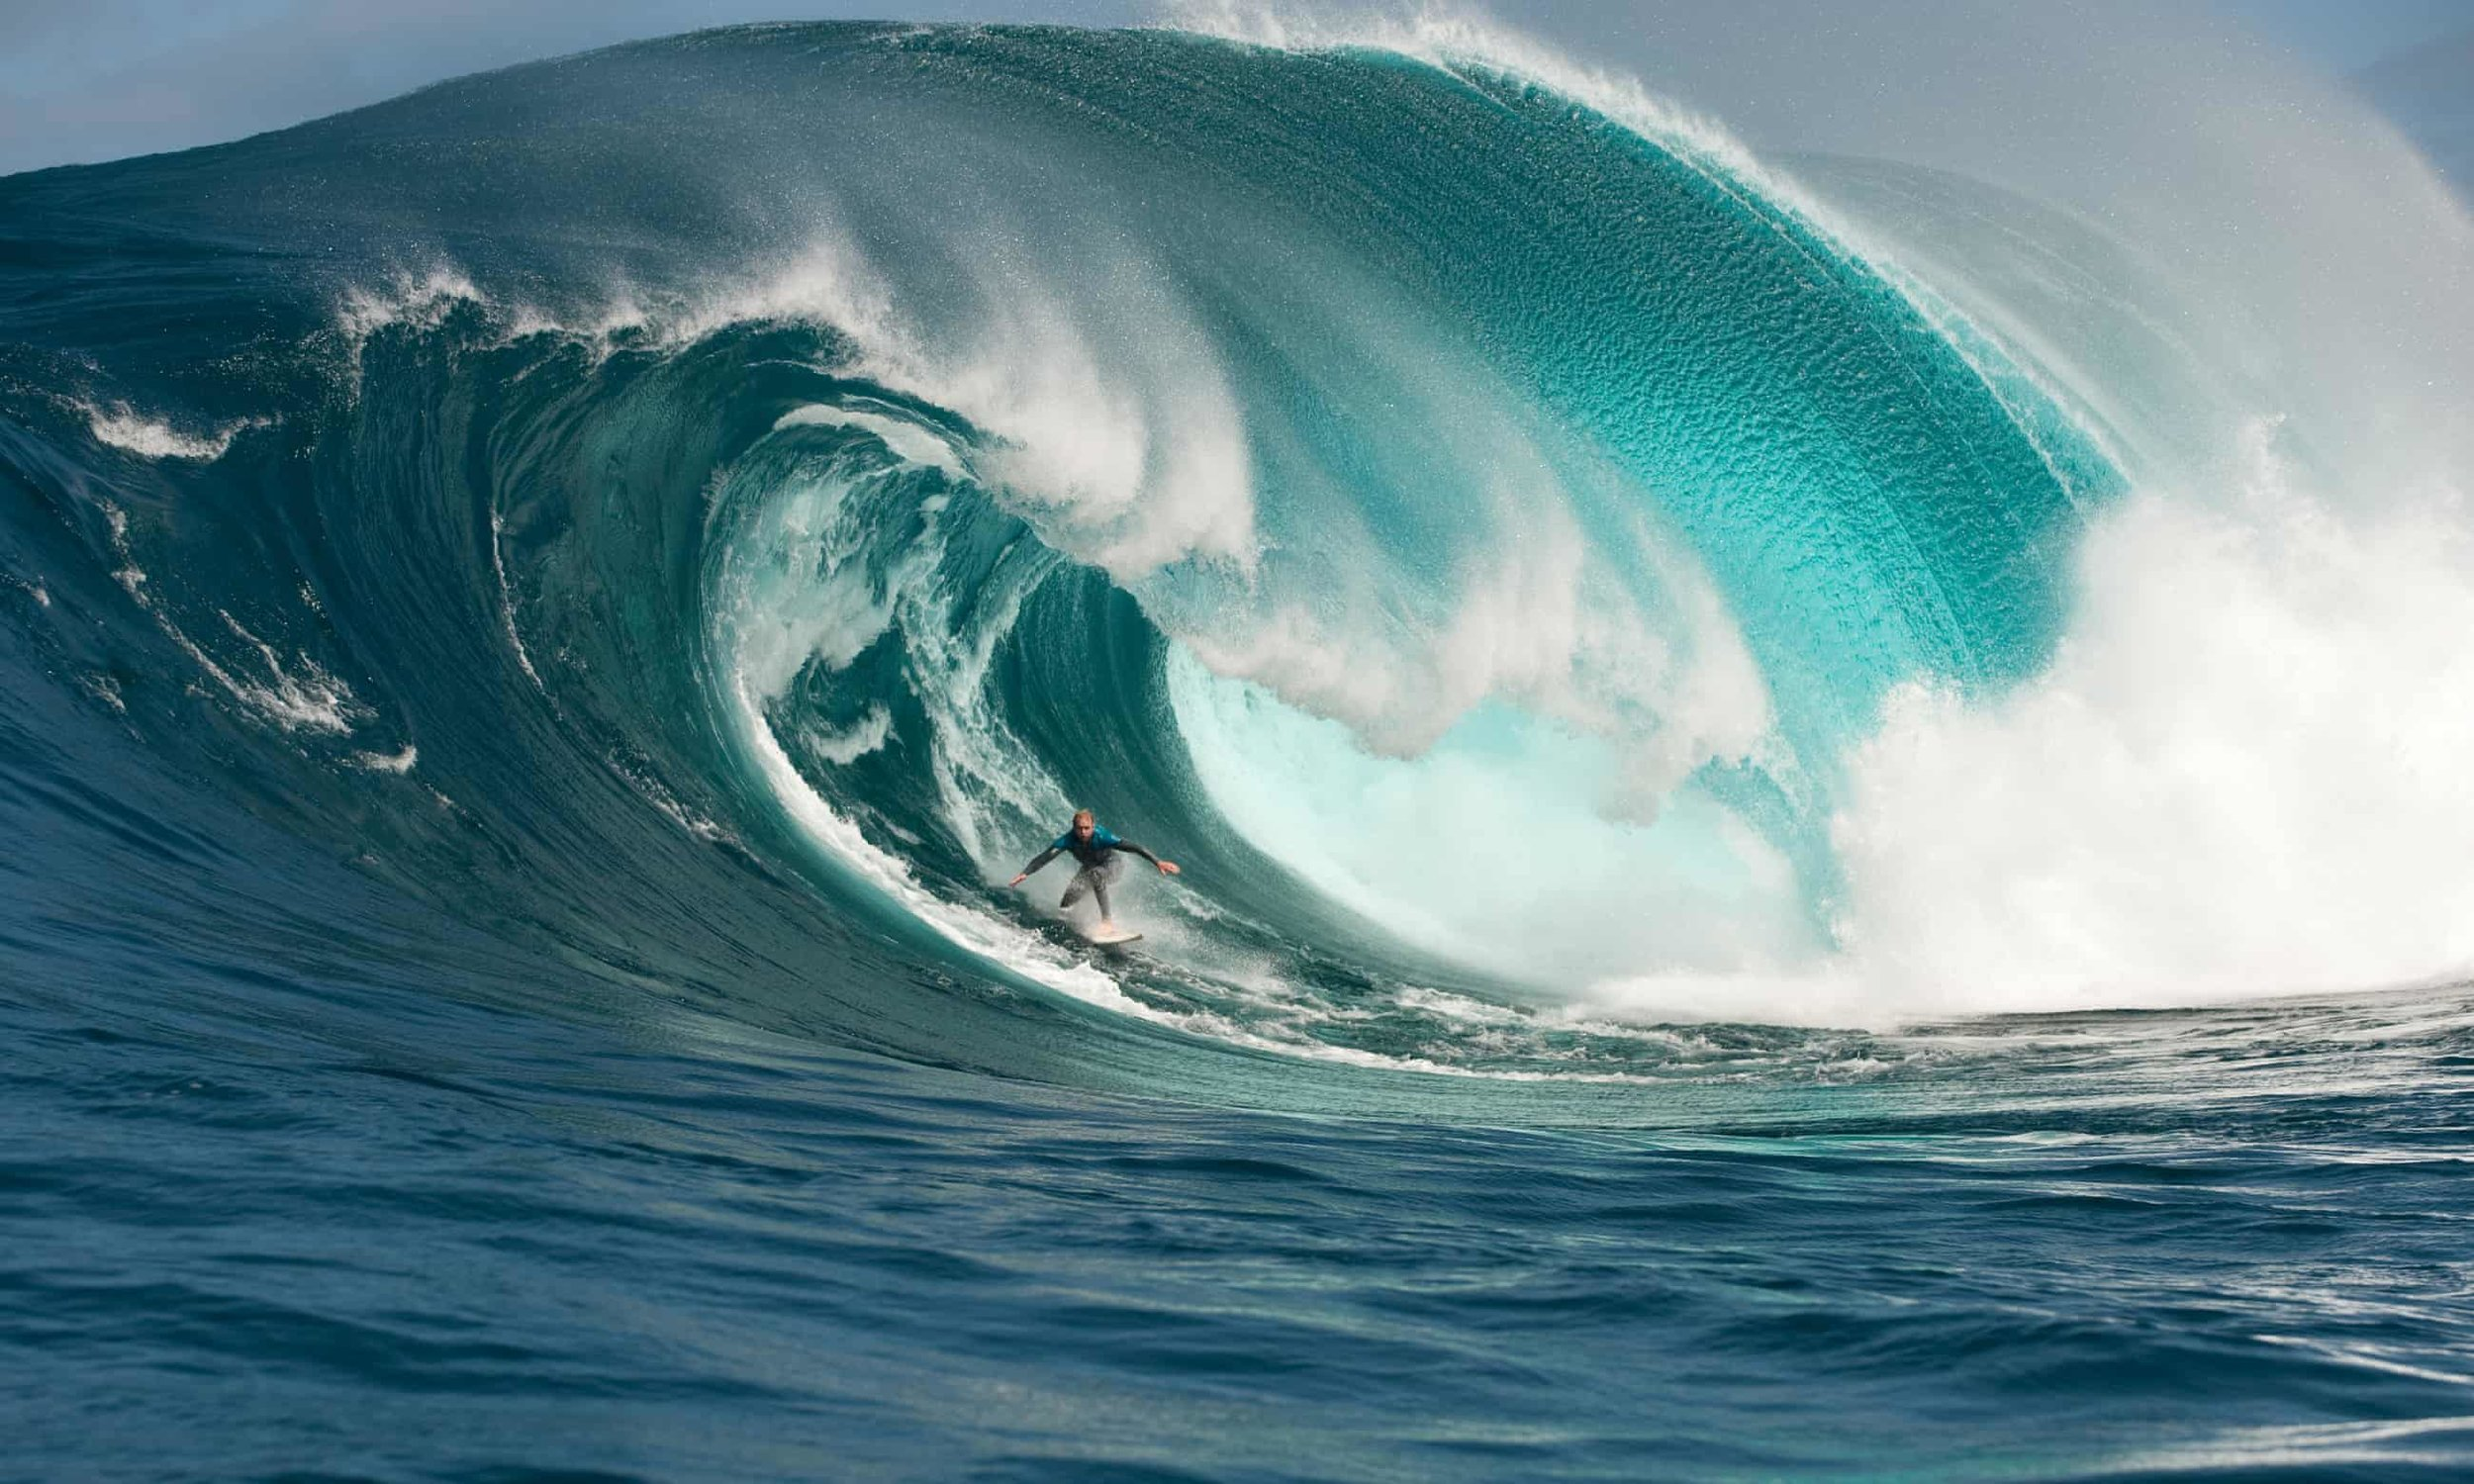 Mark Mathews surfing. Source: Surfing Life